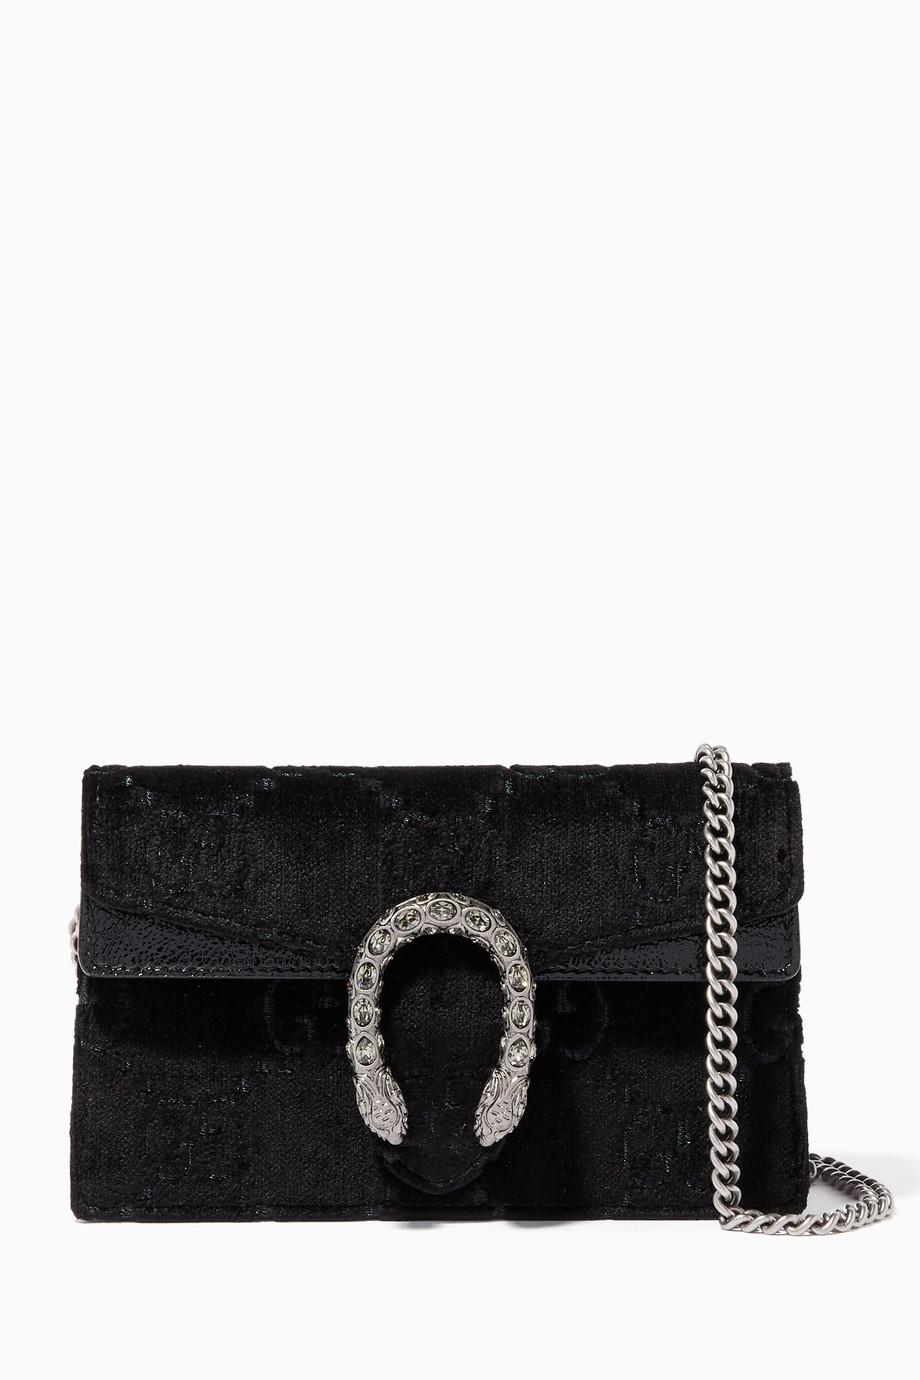 9adff70dcef Shop Gucci Black Black Velvet Super Mini Dionysus GG Bag for Women ...